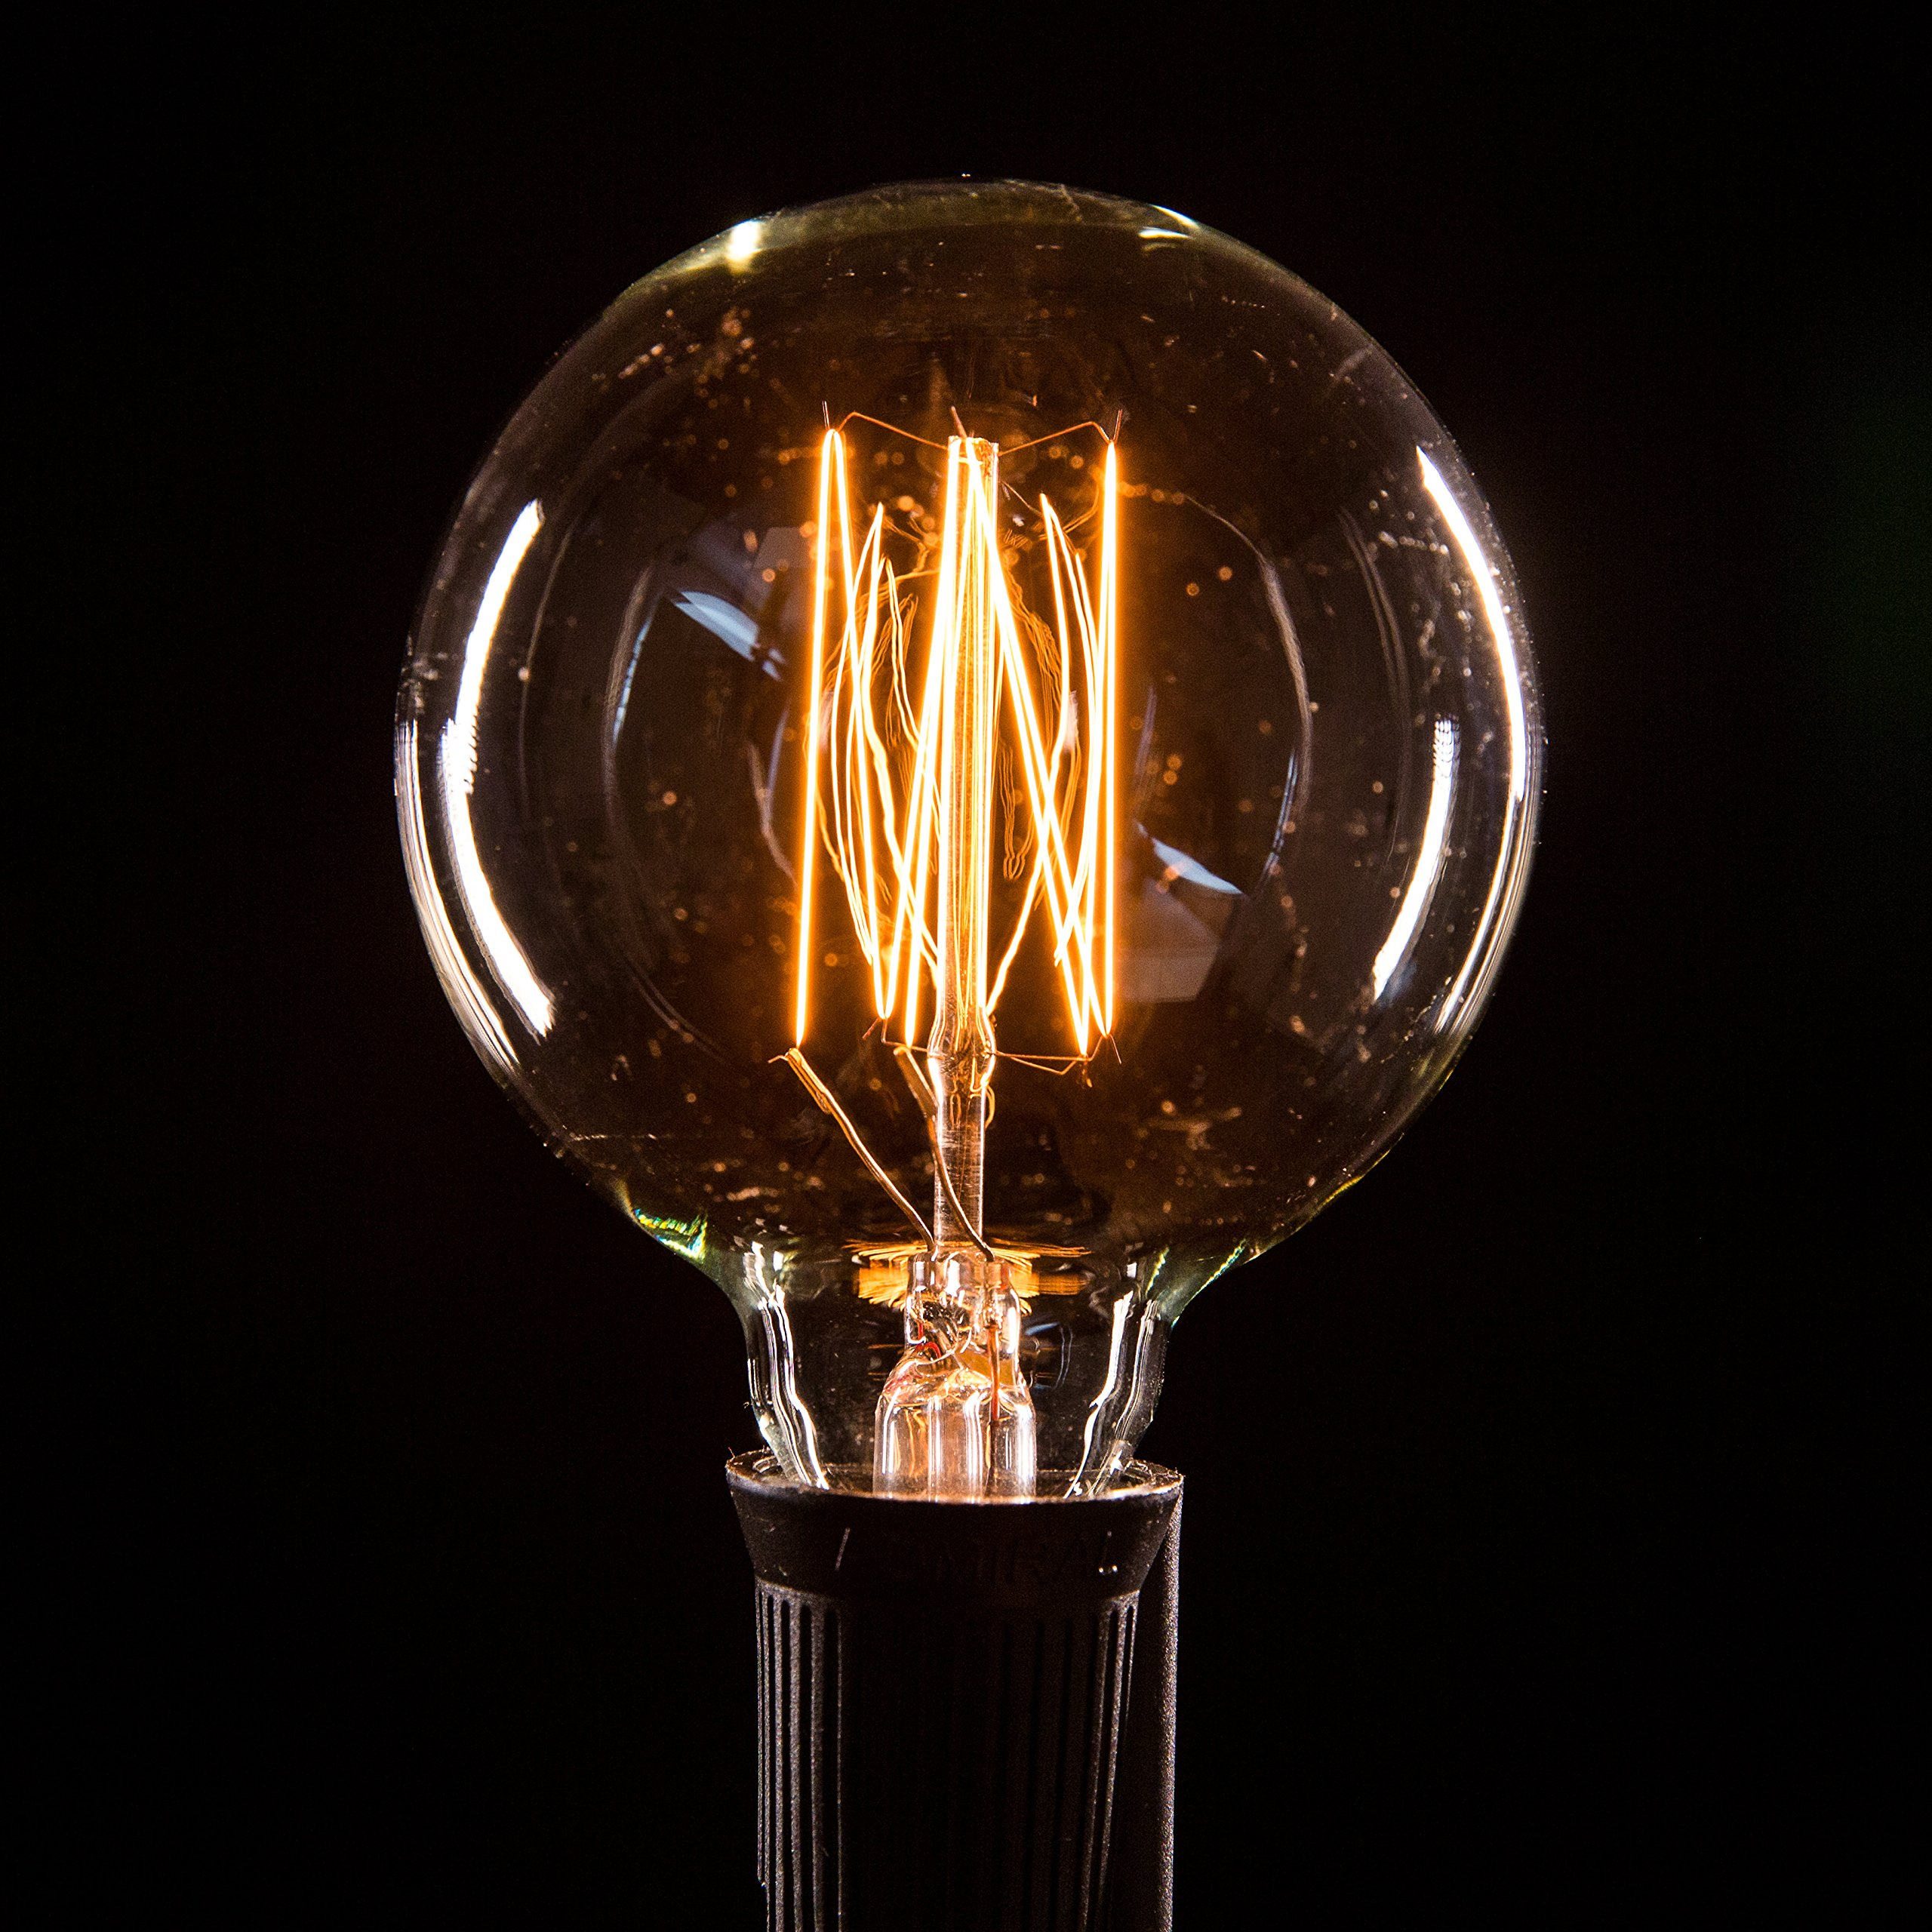 Box of 25 G60 Lantern Edison 2.5 Inch 7 Watt C9 E17 Base Replacement Bulbs by Hometown Evolution, Inc. (Image #1)